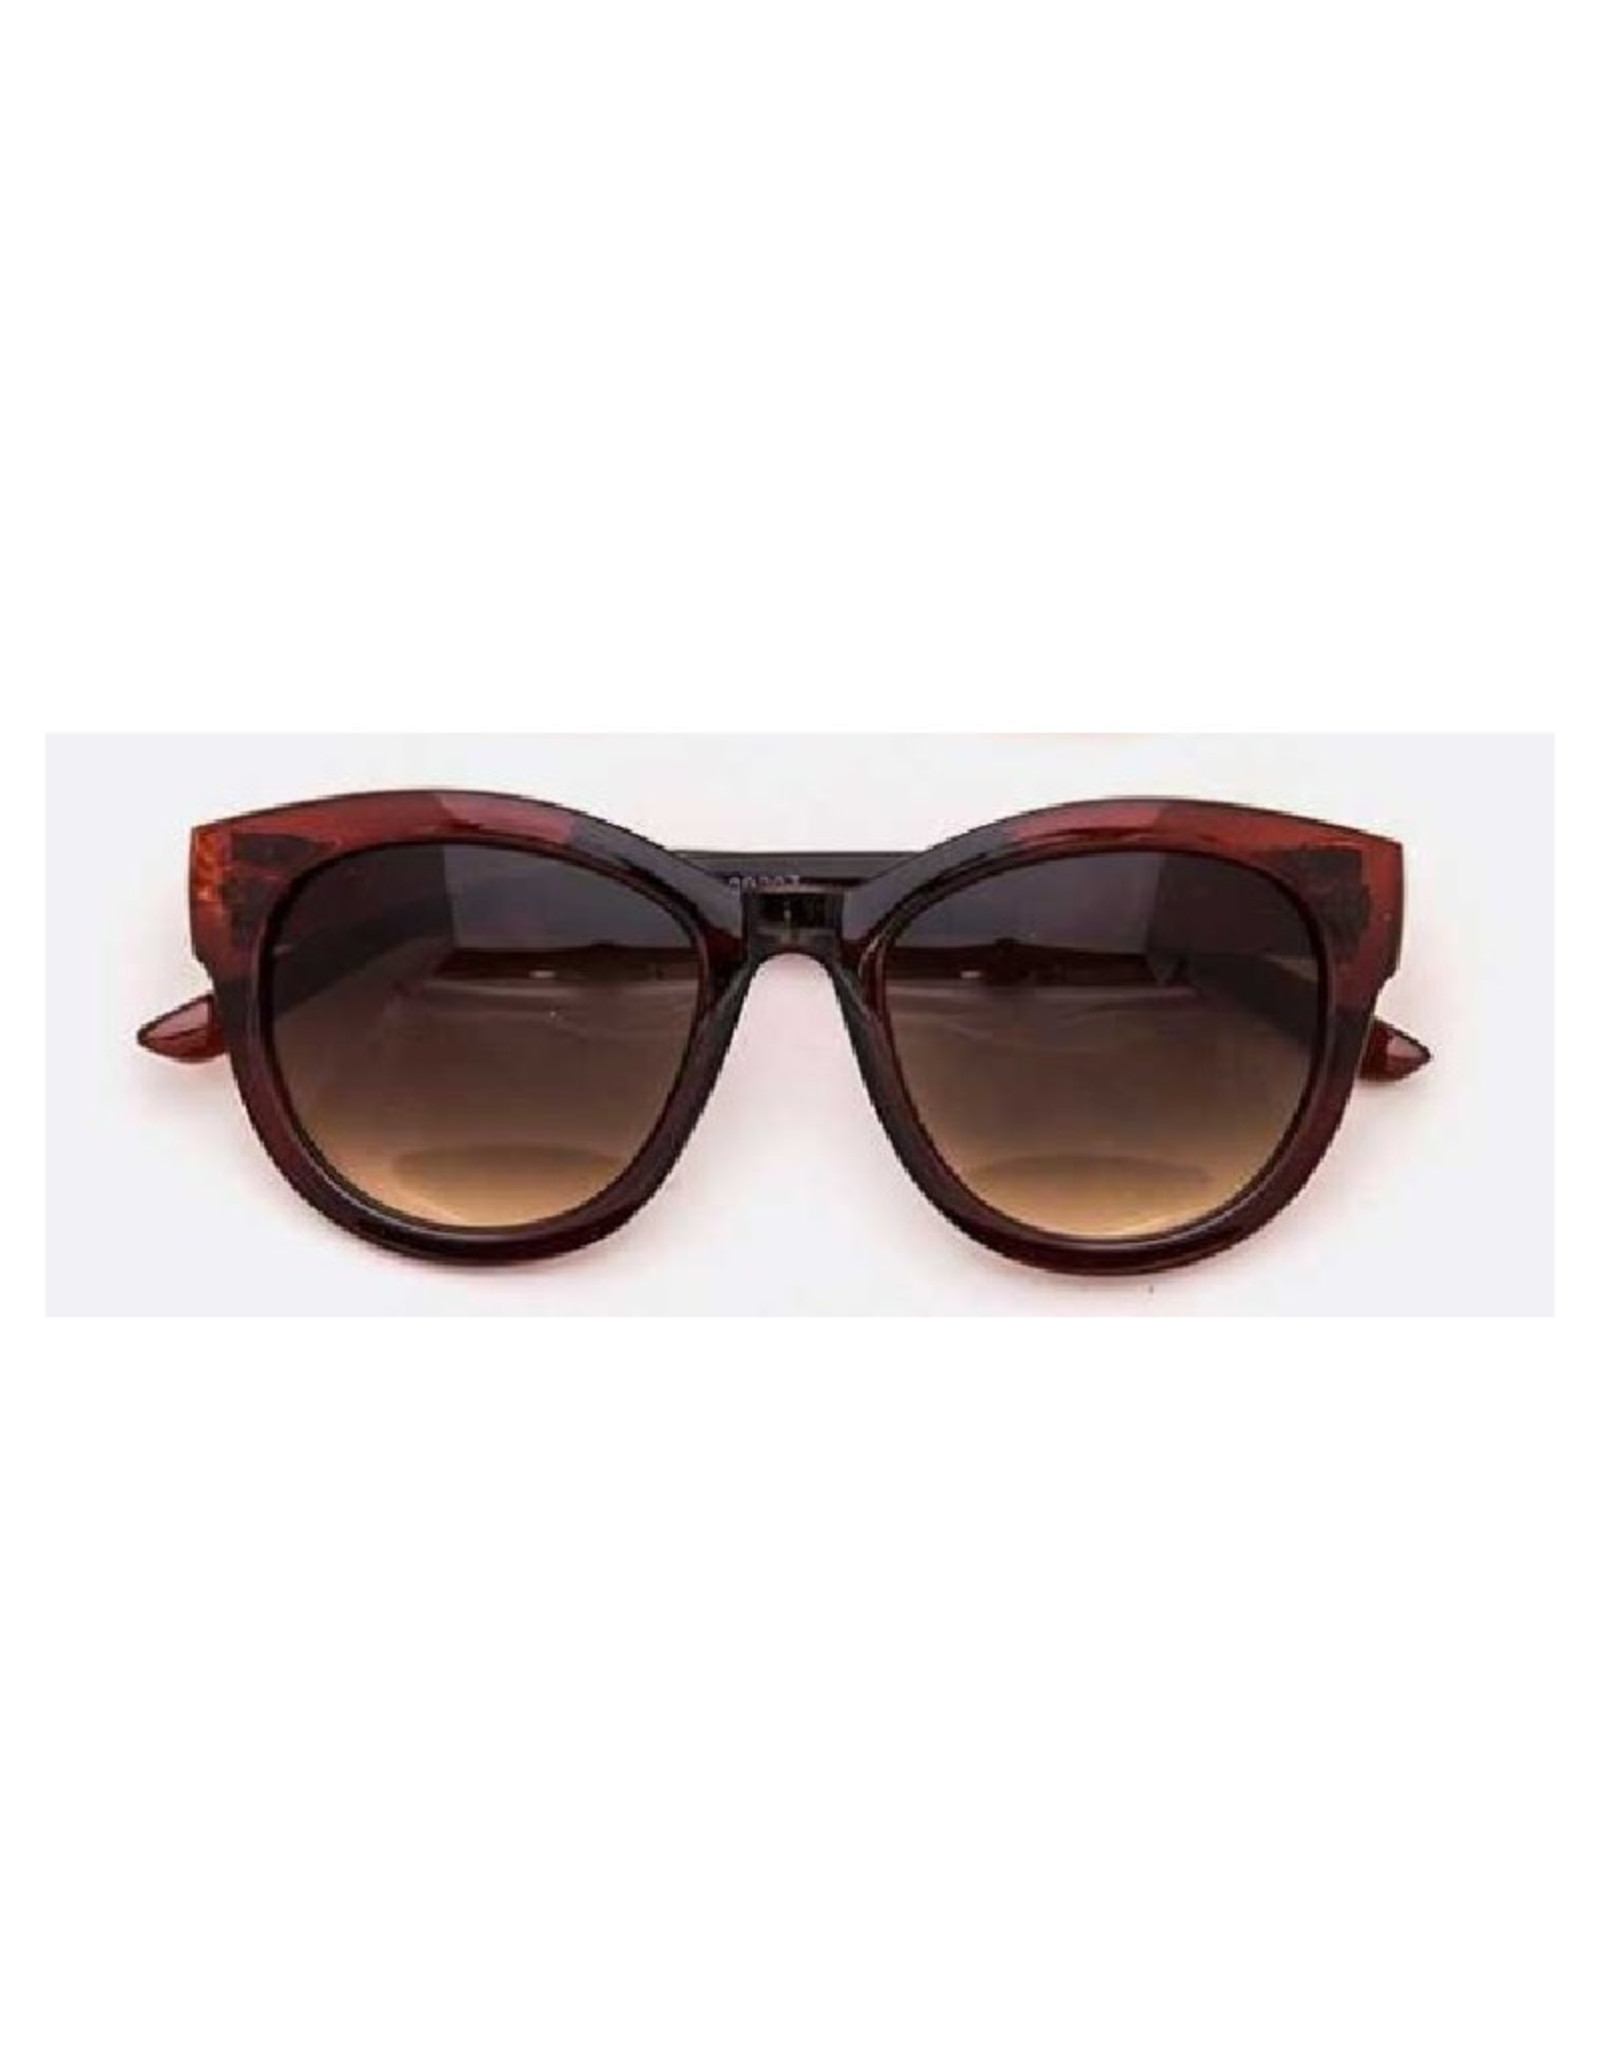 Sunglasses - Brown Frame